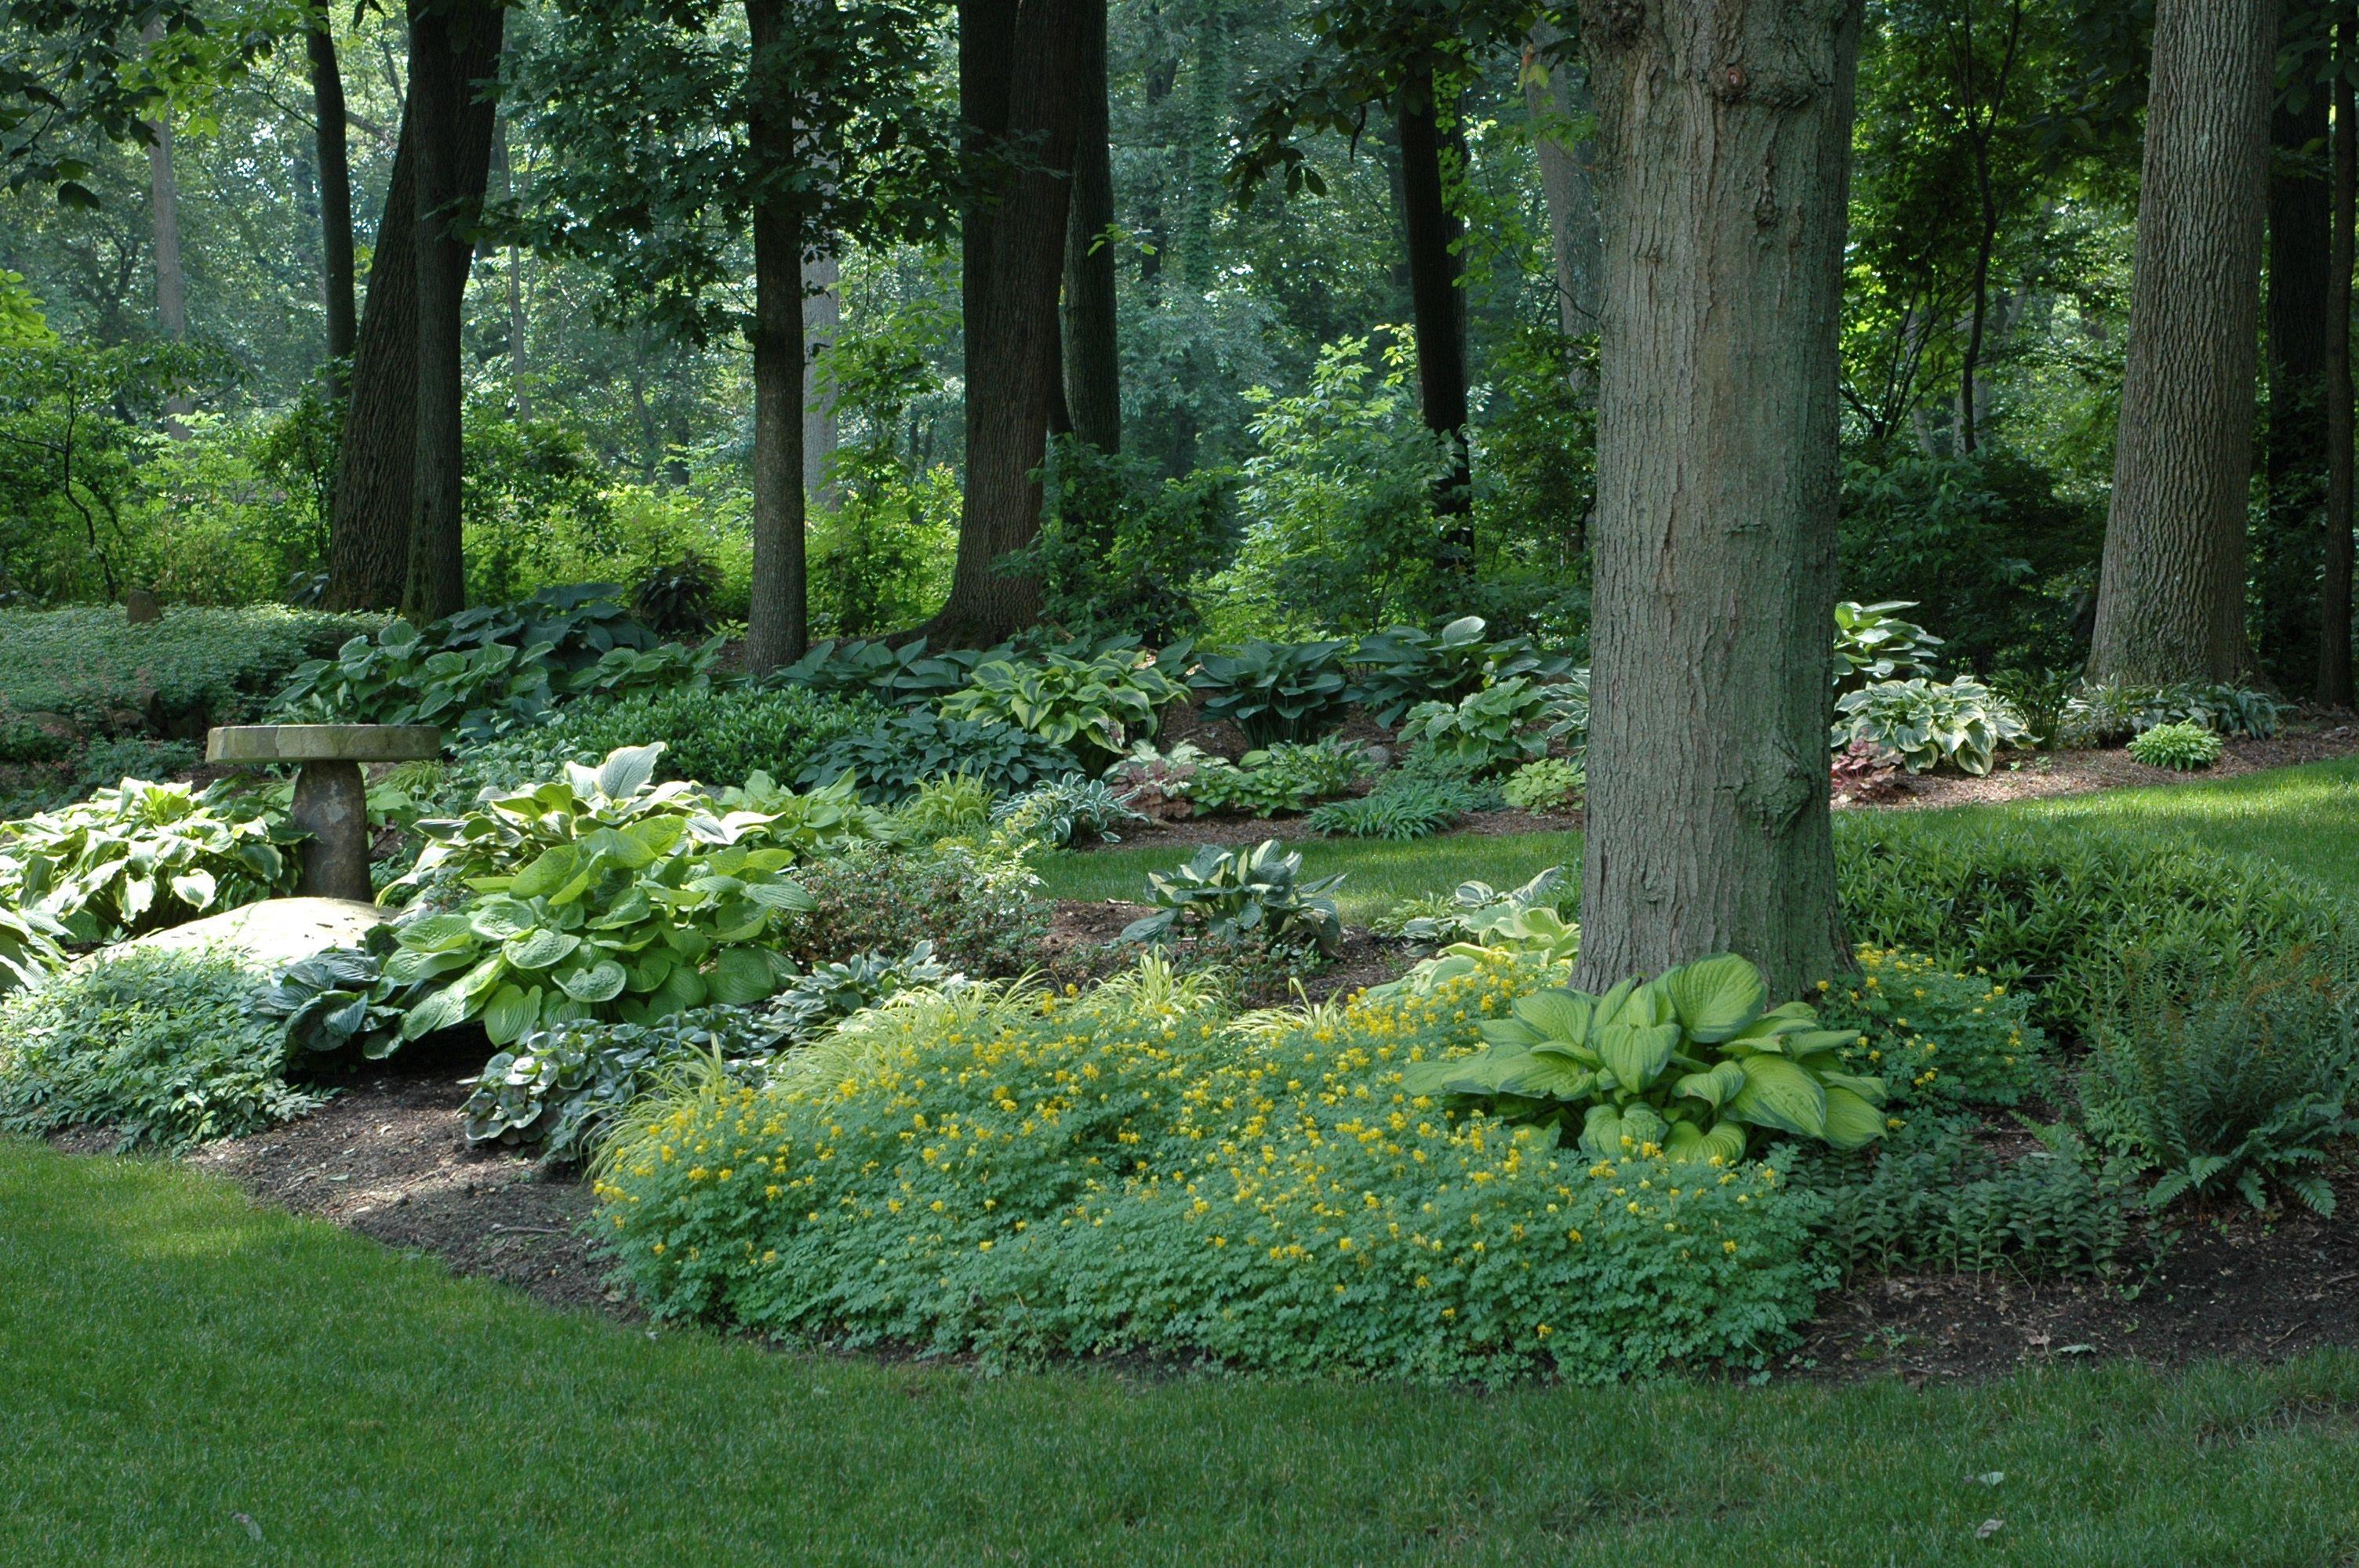 Shade garden woodland landscapes pinterest for Woodland shade garden designs